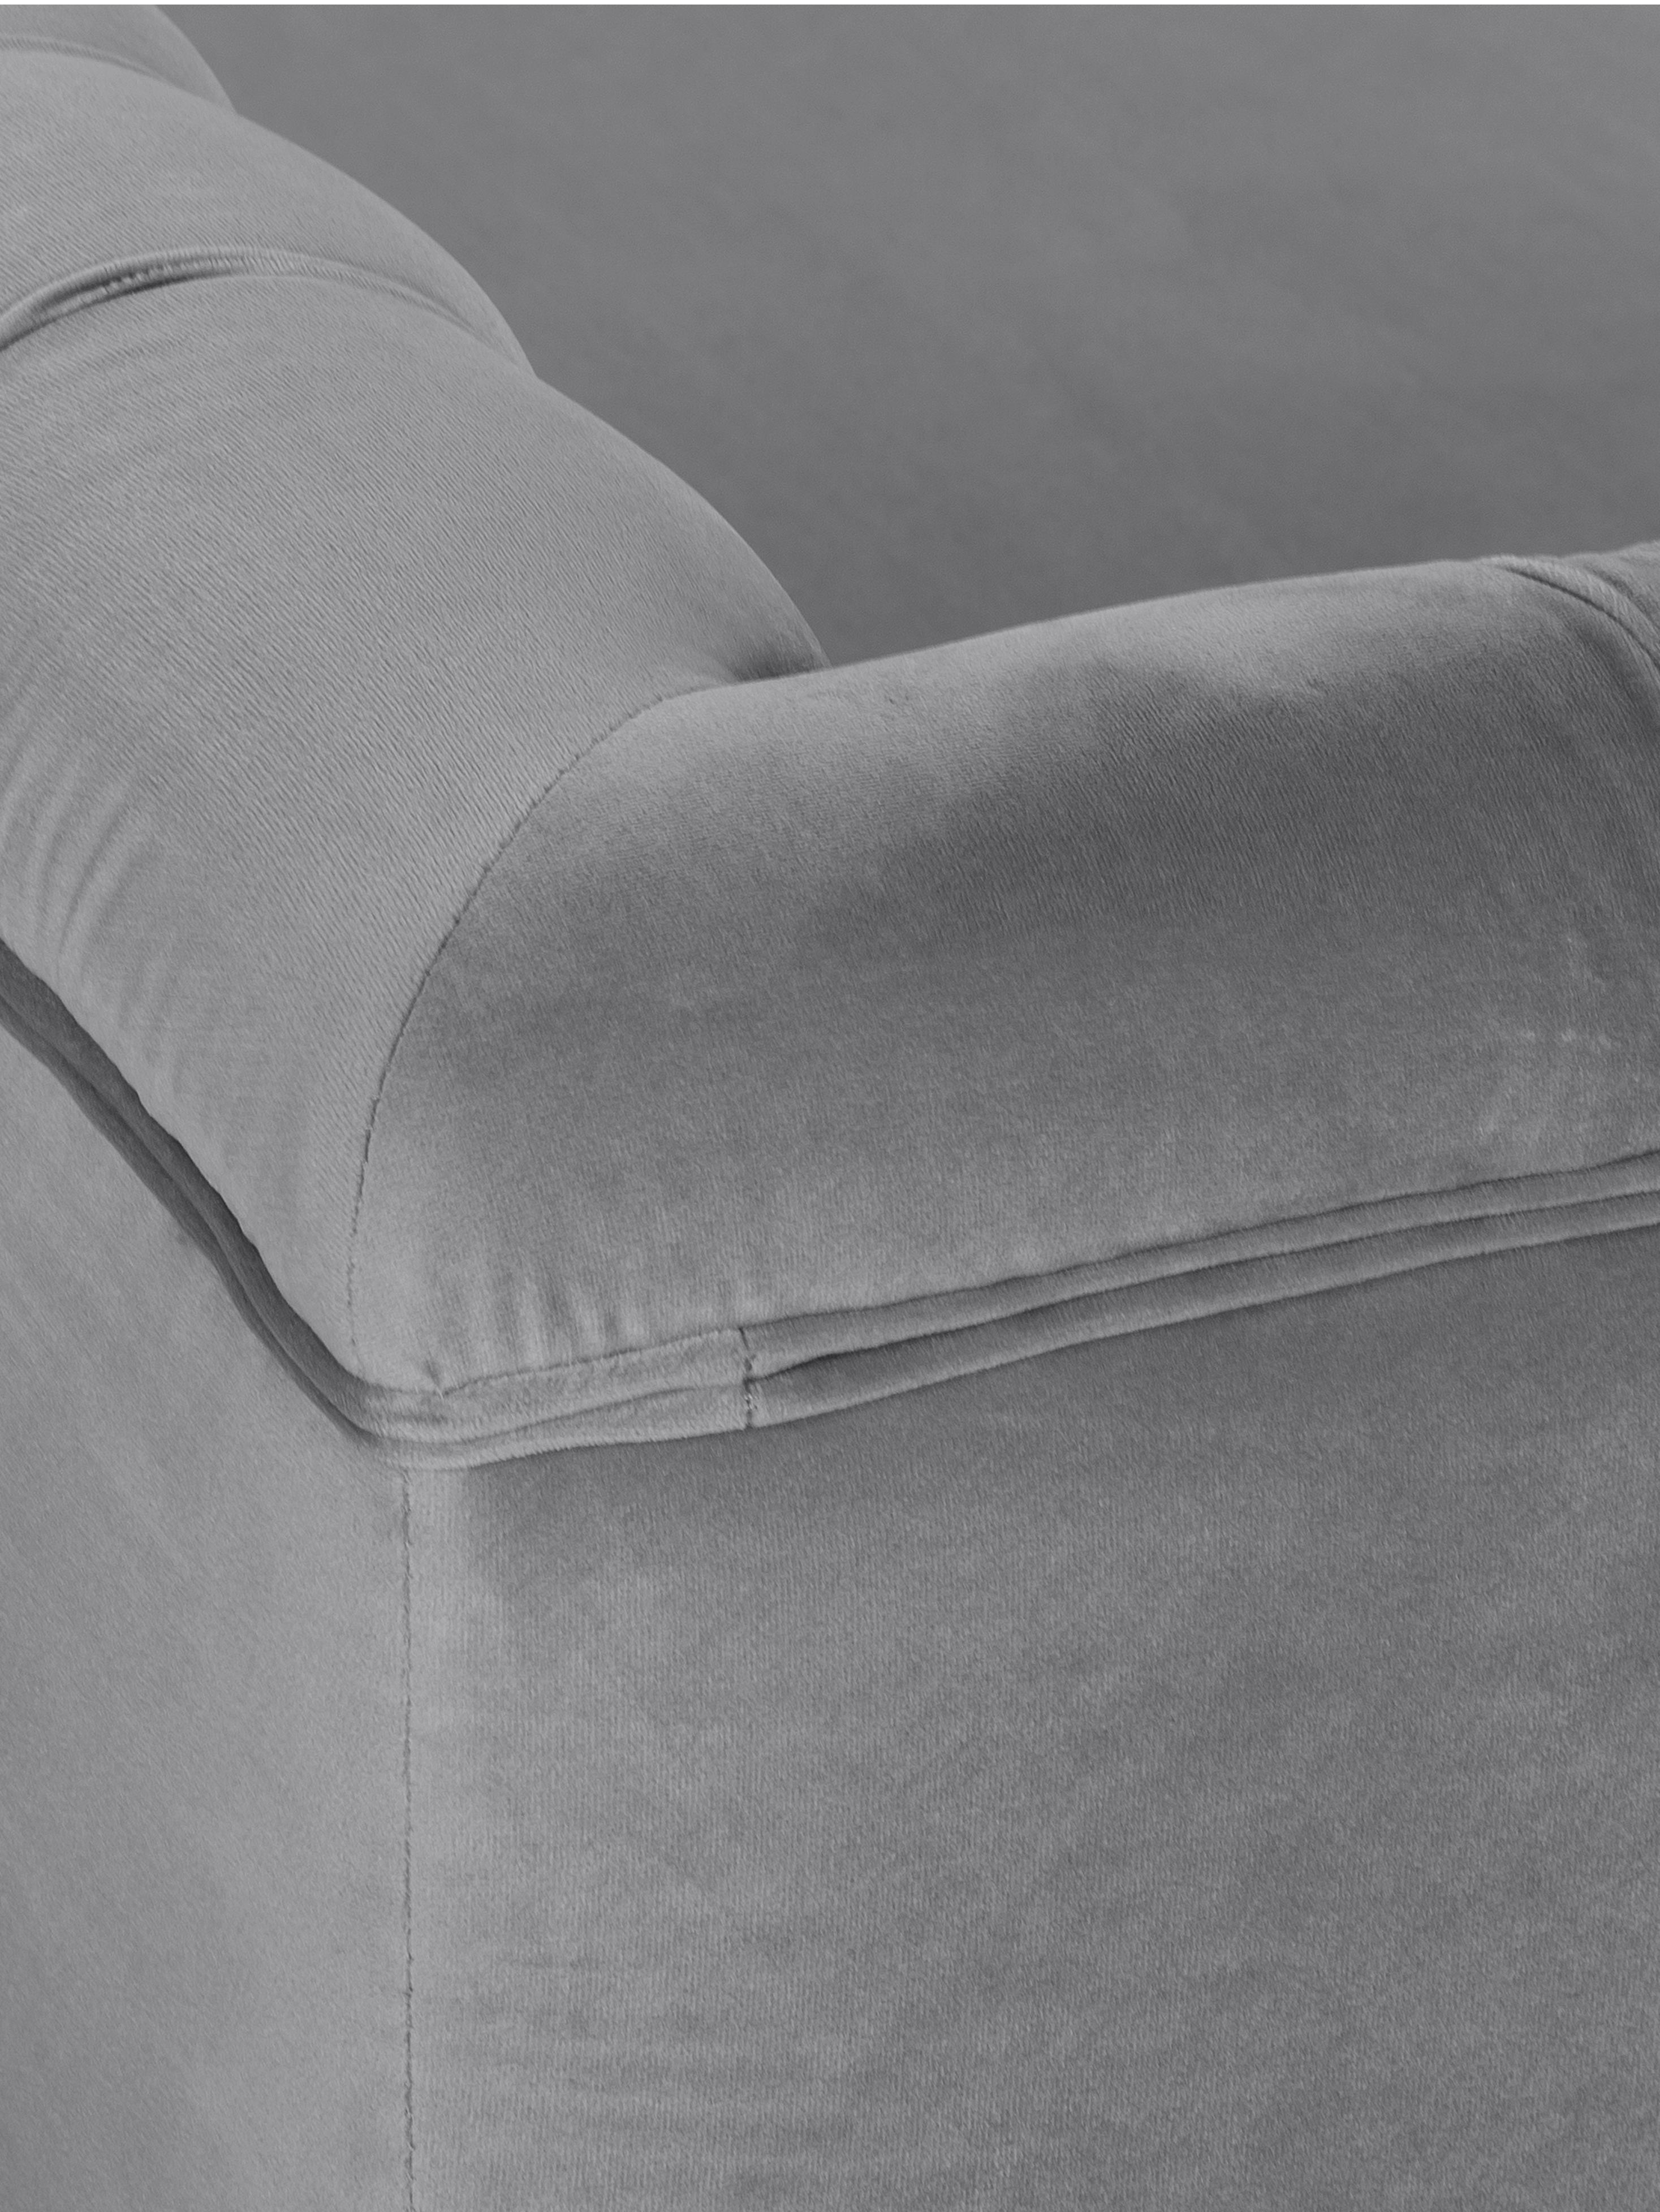 Chesterfield-Samt-Sofa Chiara (2-Sitzer), Bezug: Samt (Polyester) 20.000 S, Gestell: Massives Birkenholz, Füße: Metall, galvanisiert, Samt Grau, B 170 x T 72 cm